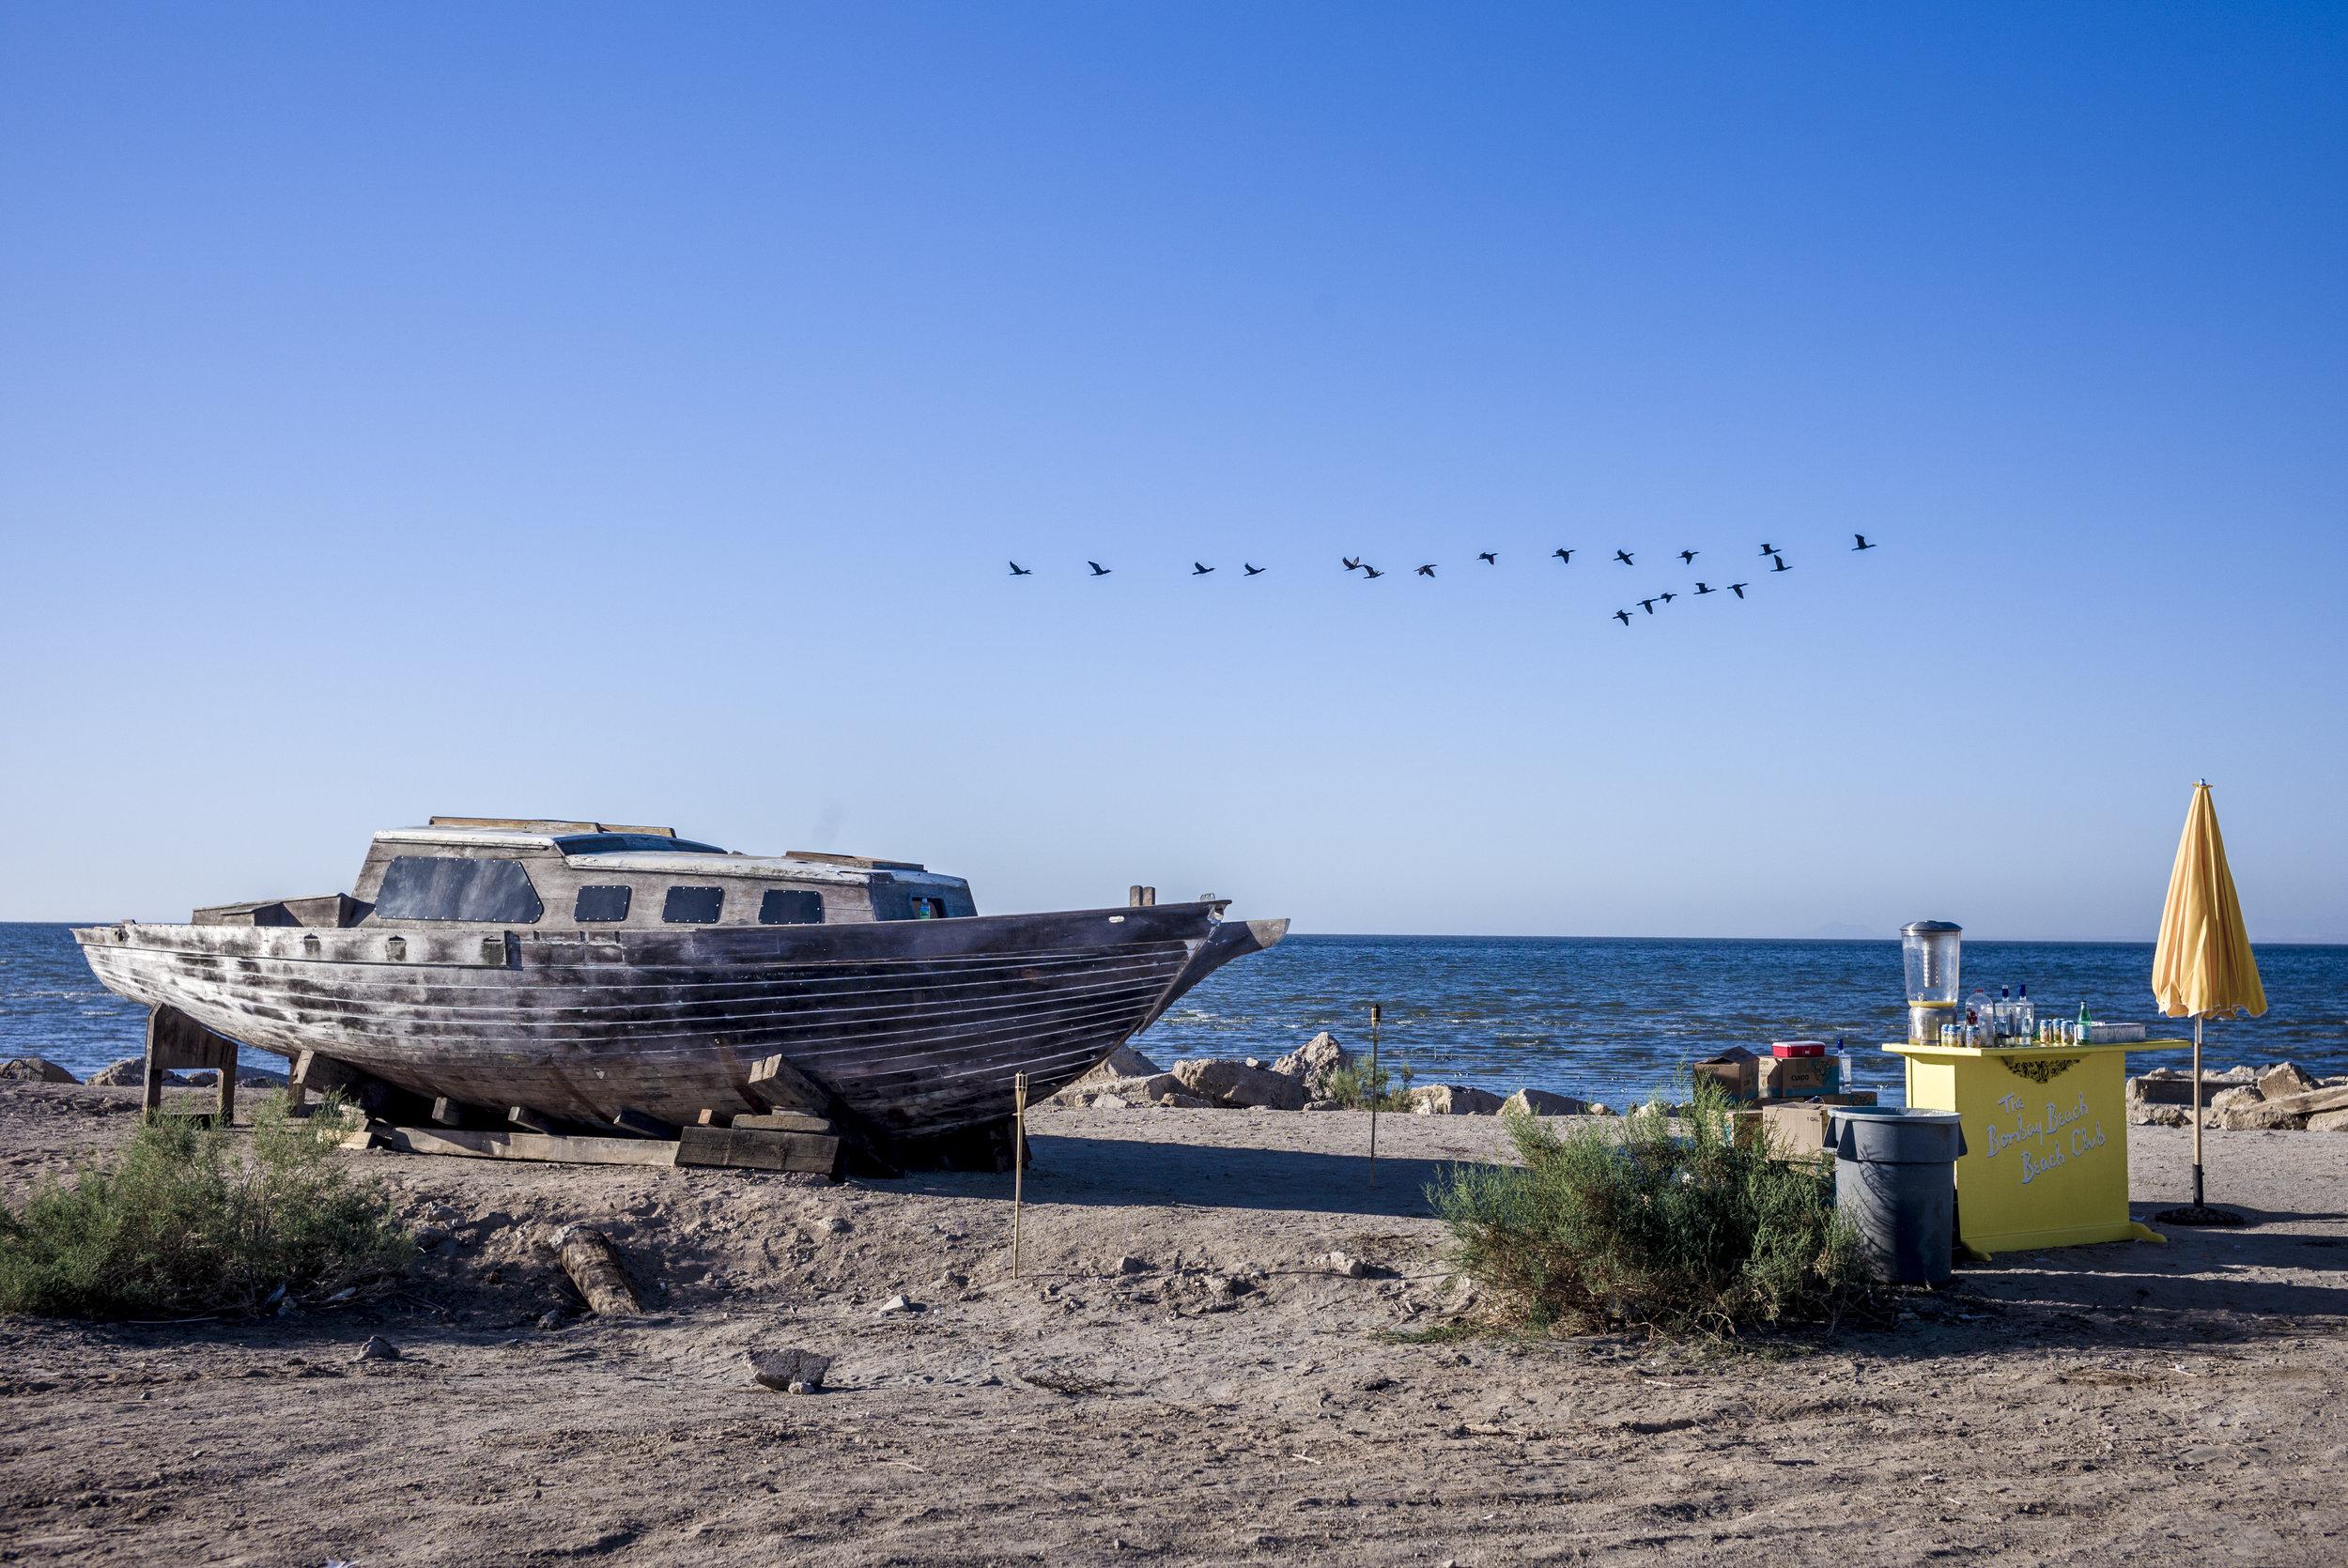 Shipwreck_photo by Tao Ruspoli.jpg